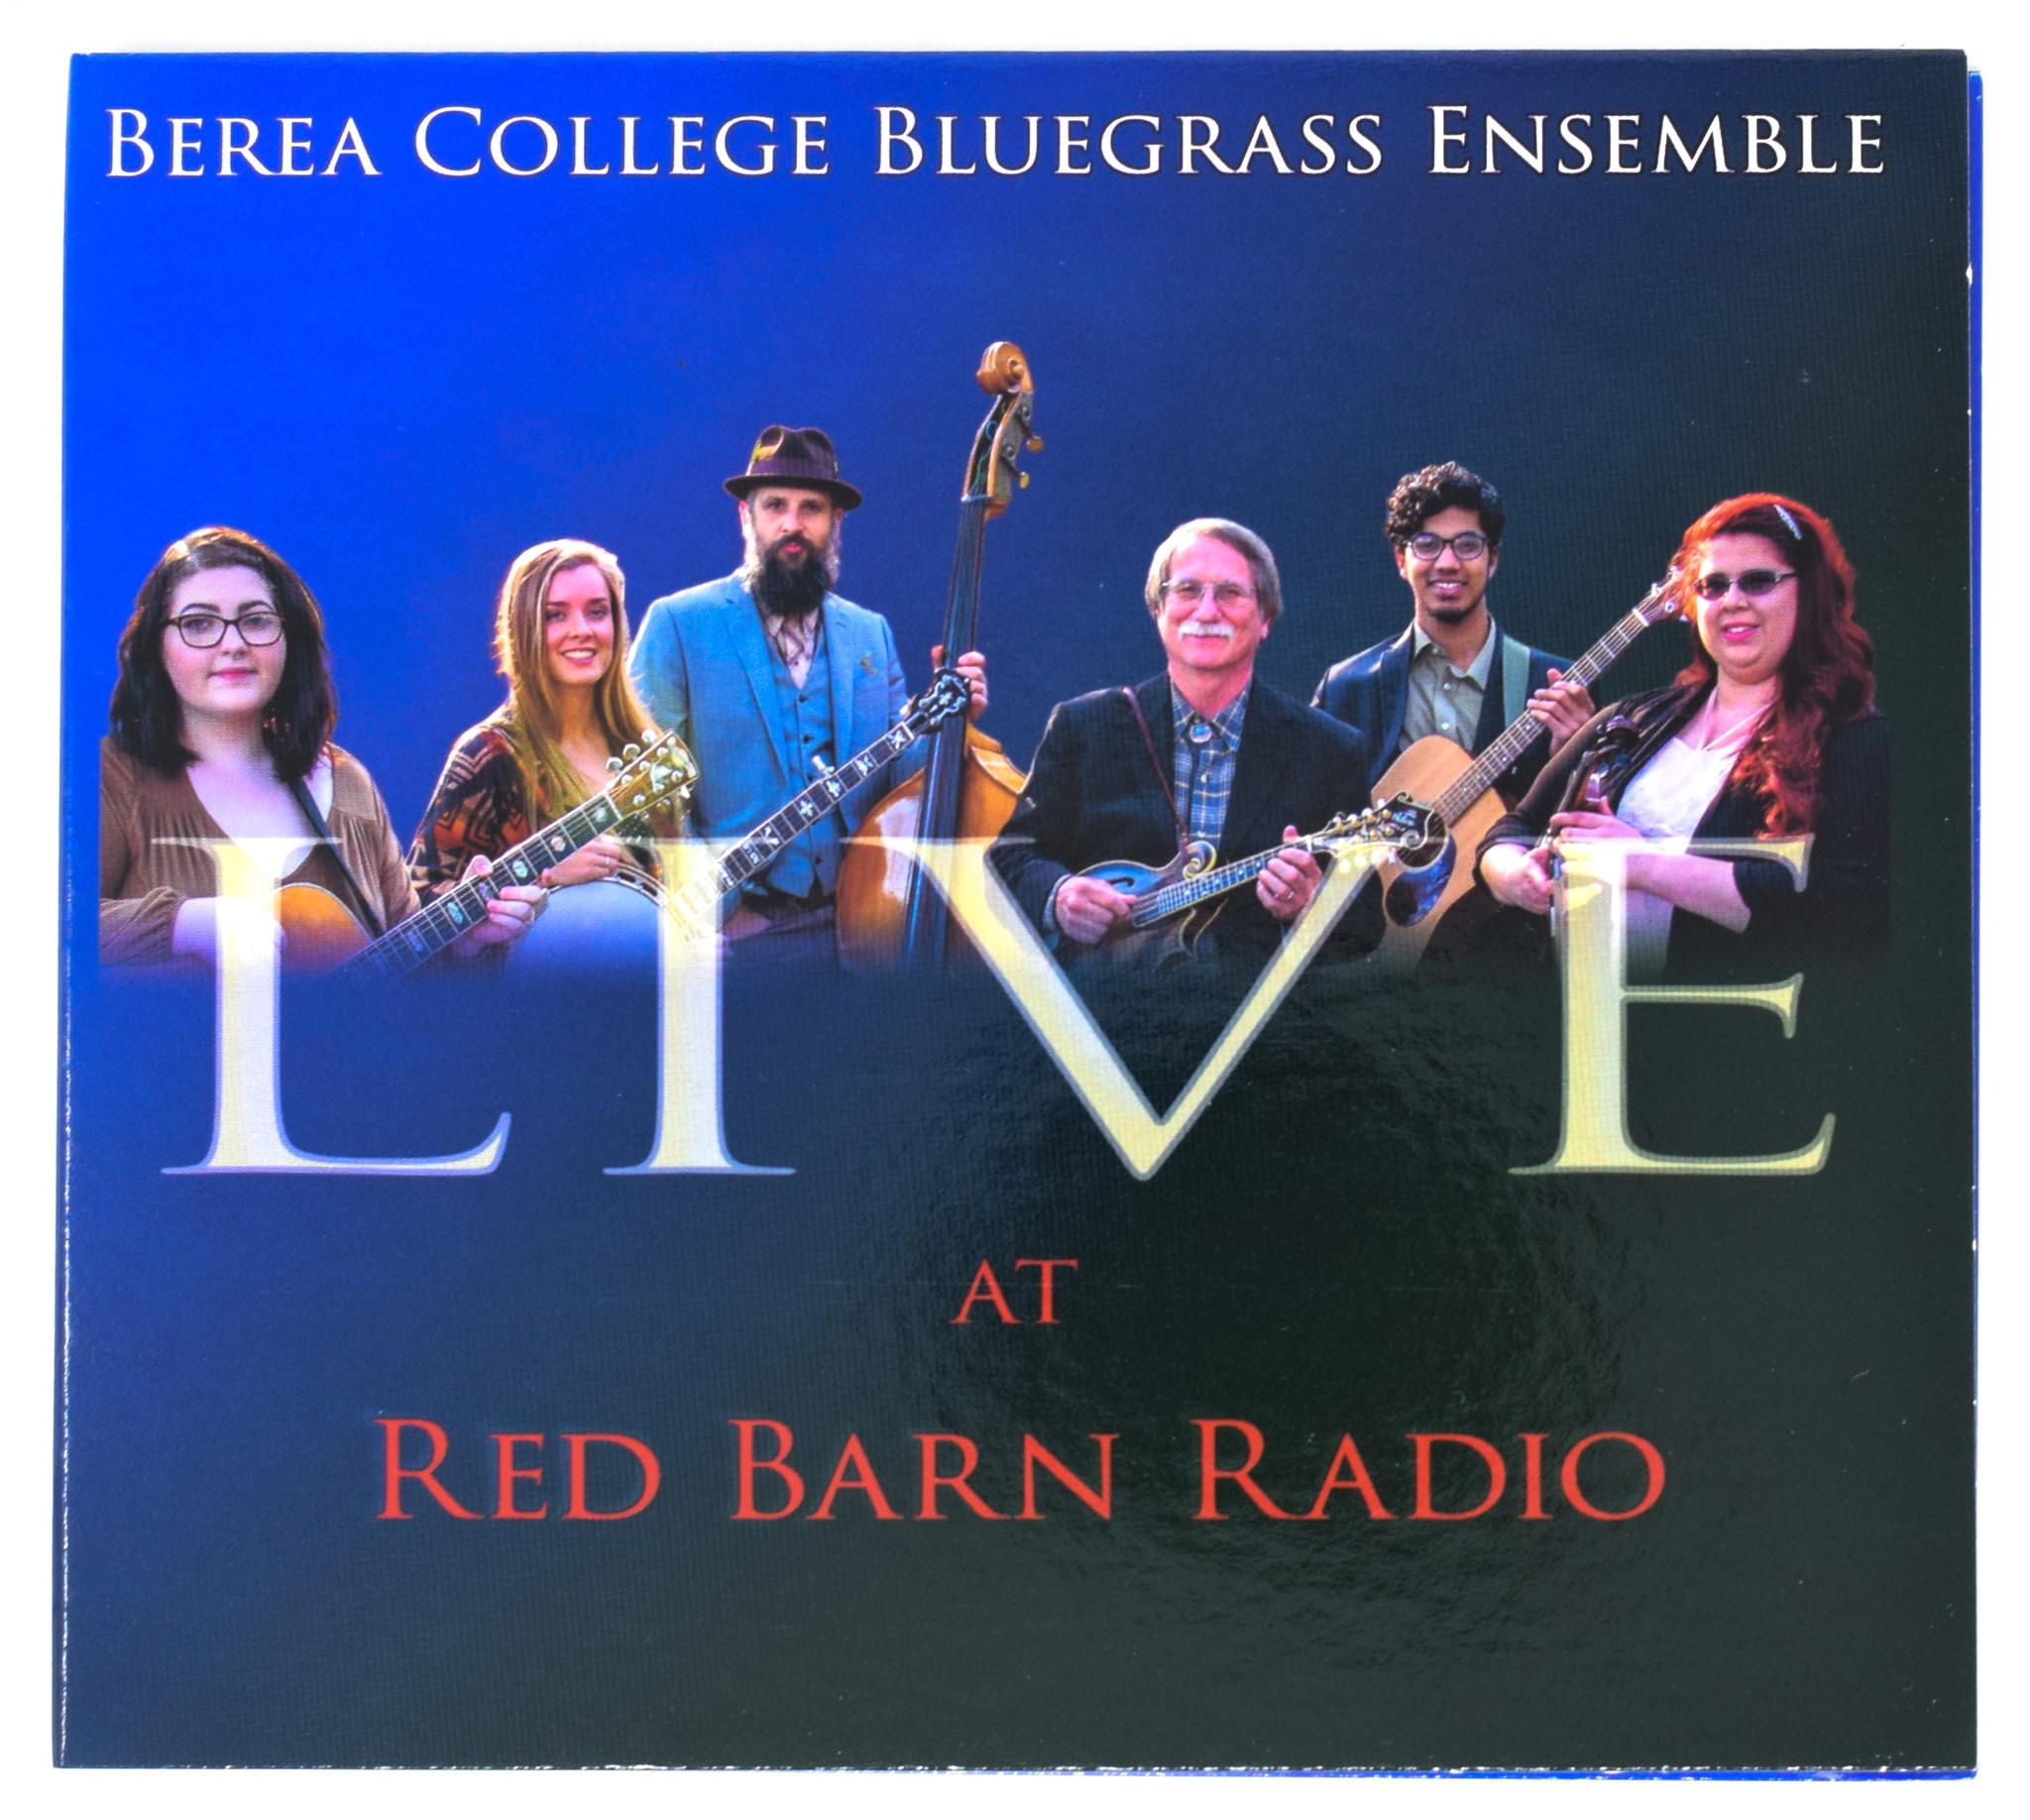 Al White Live At Red Barn Radio,CD, Berea College Bluegrass Ensemble